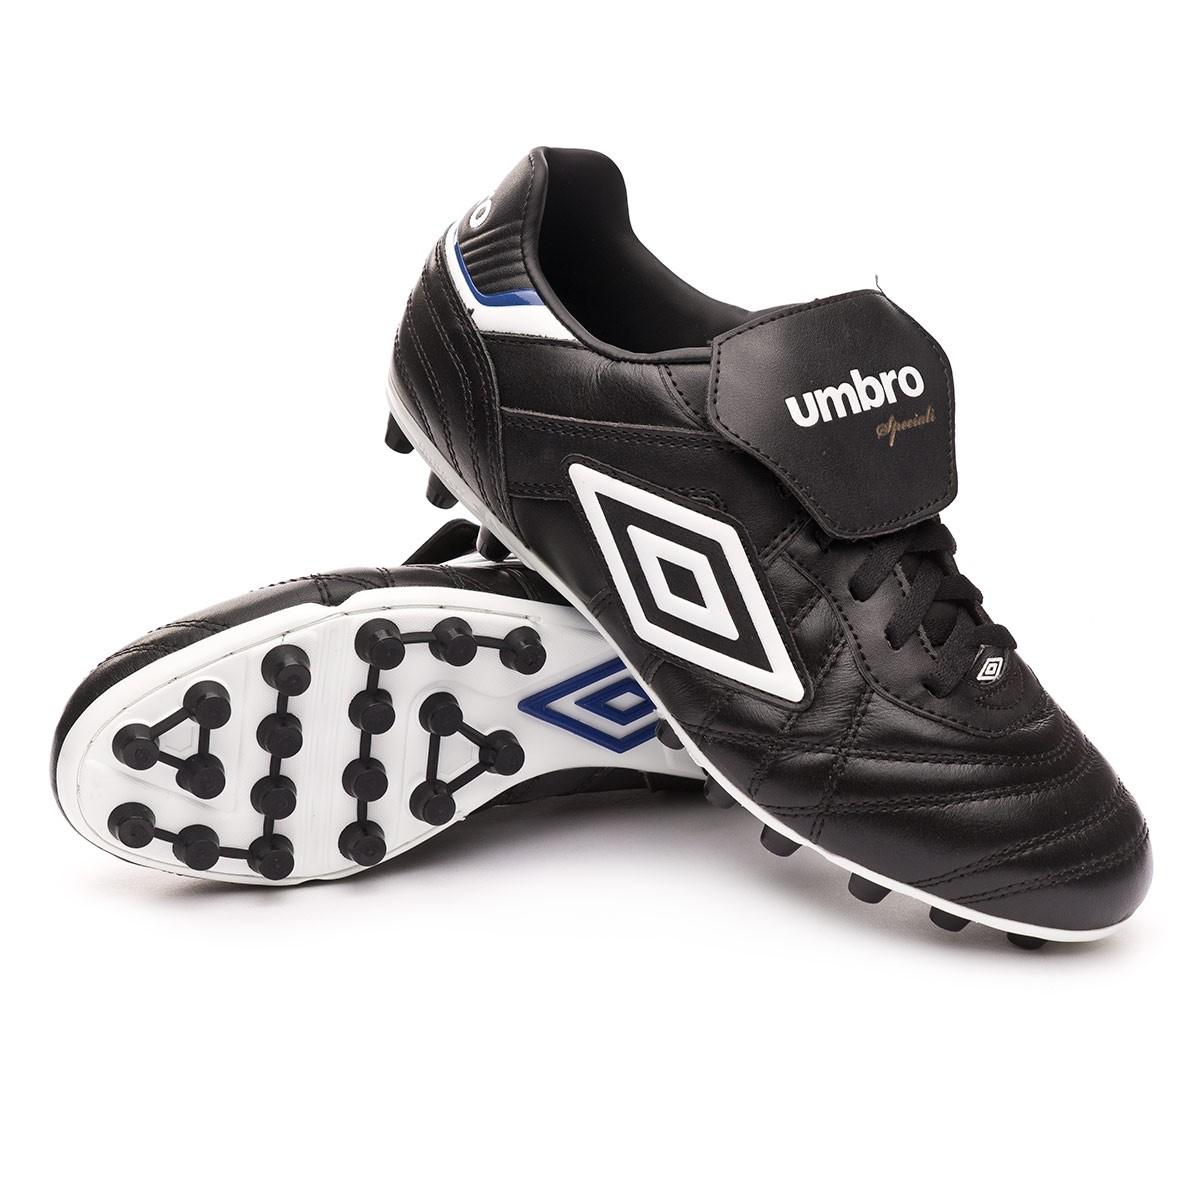 Umbro Speciali Eternal Premier AG Football Boots